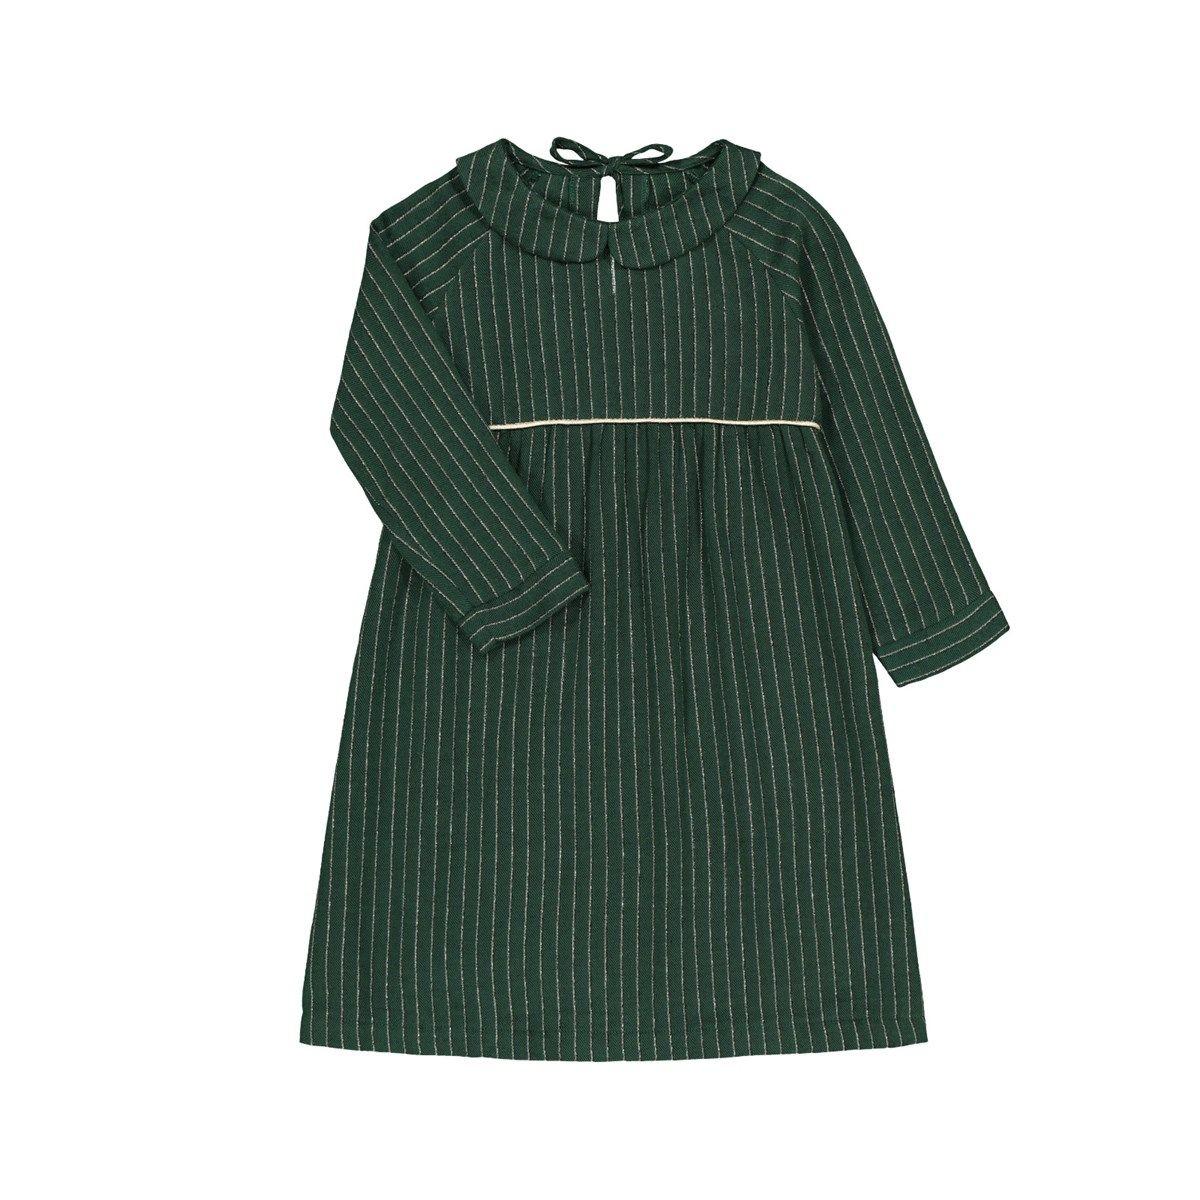 Robe vert sapin rayures Fil textile col claudine